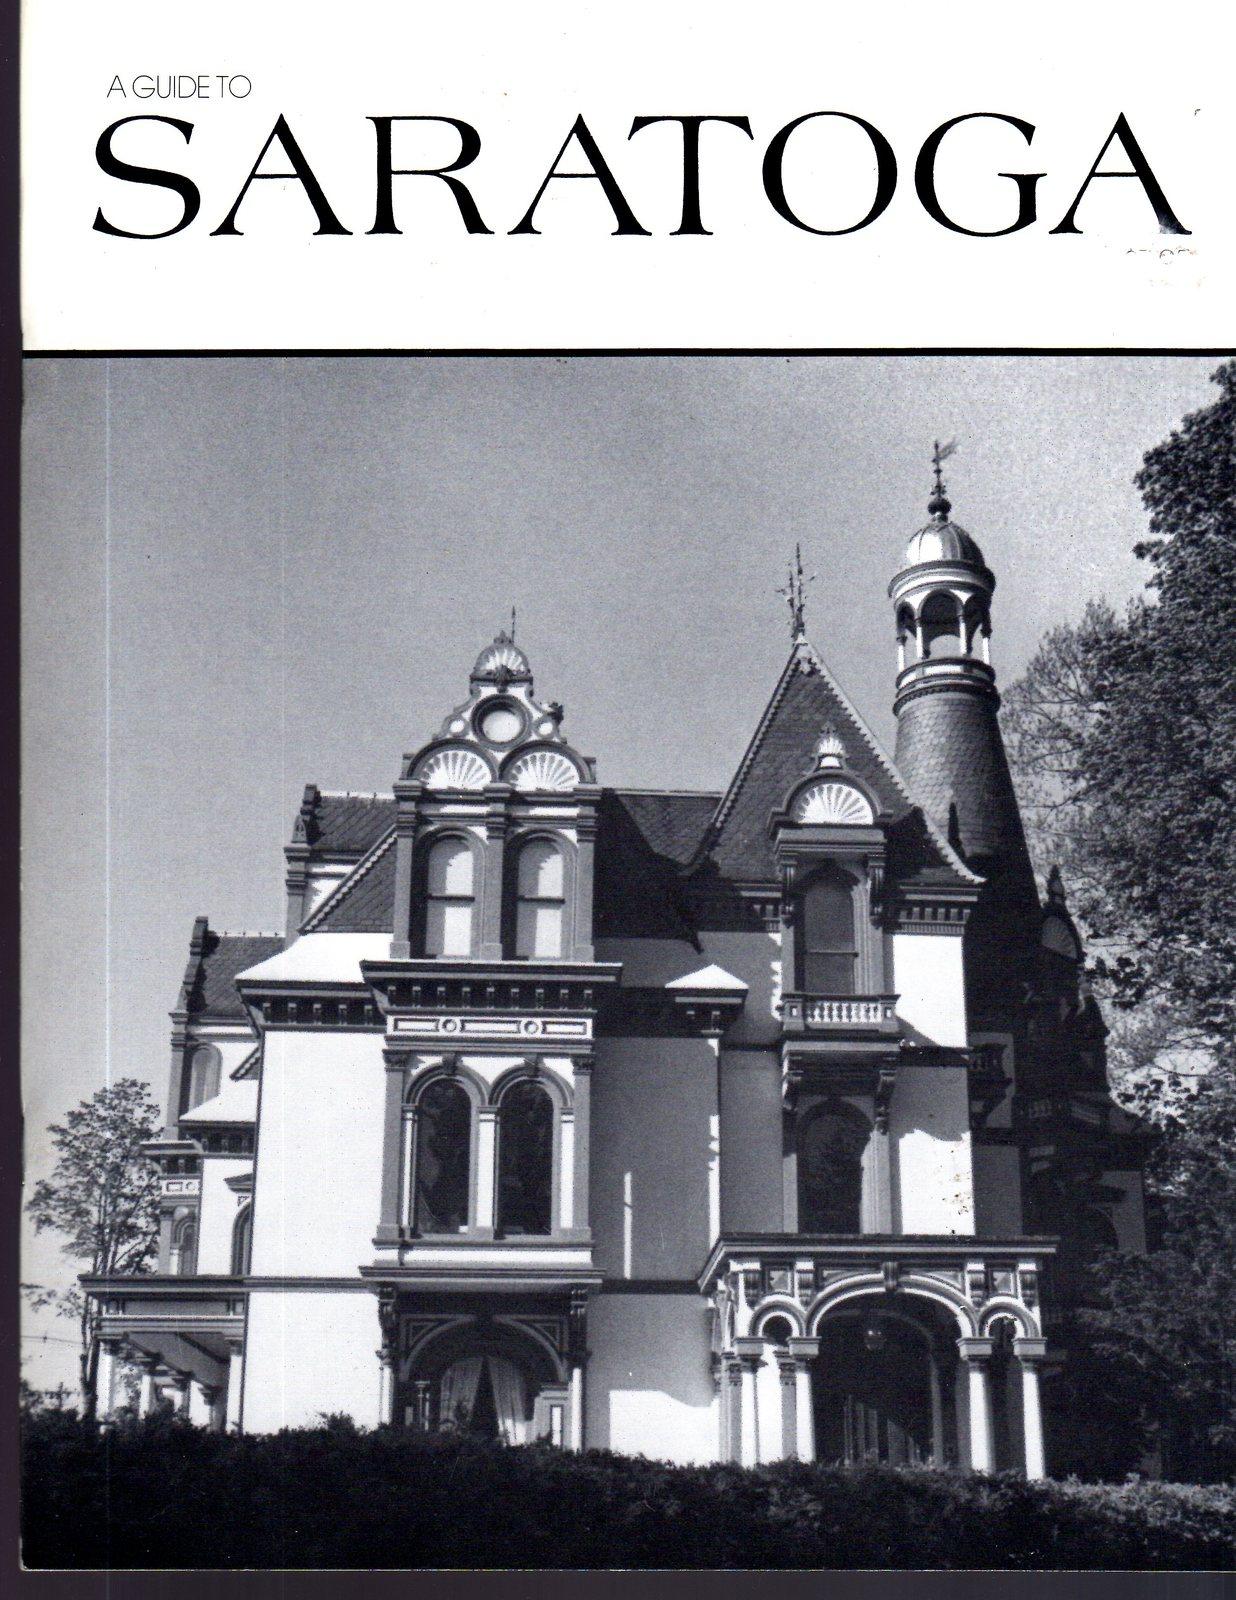 SARATOGA (A Guide to Saratoga, New York) Book